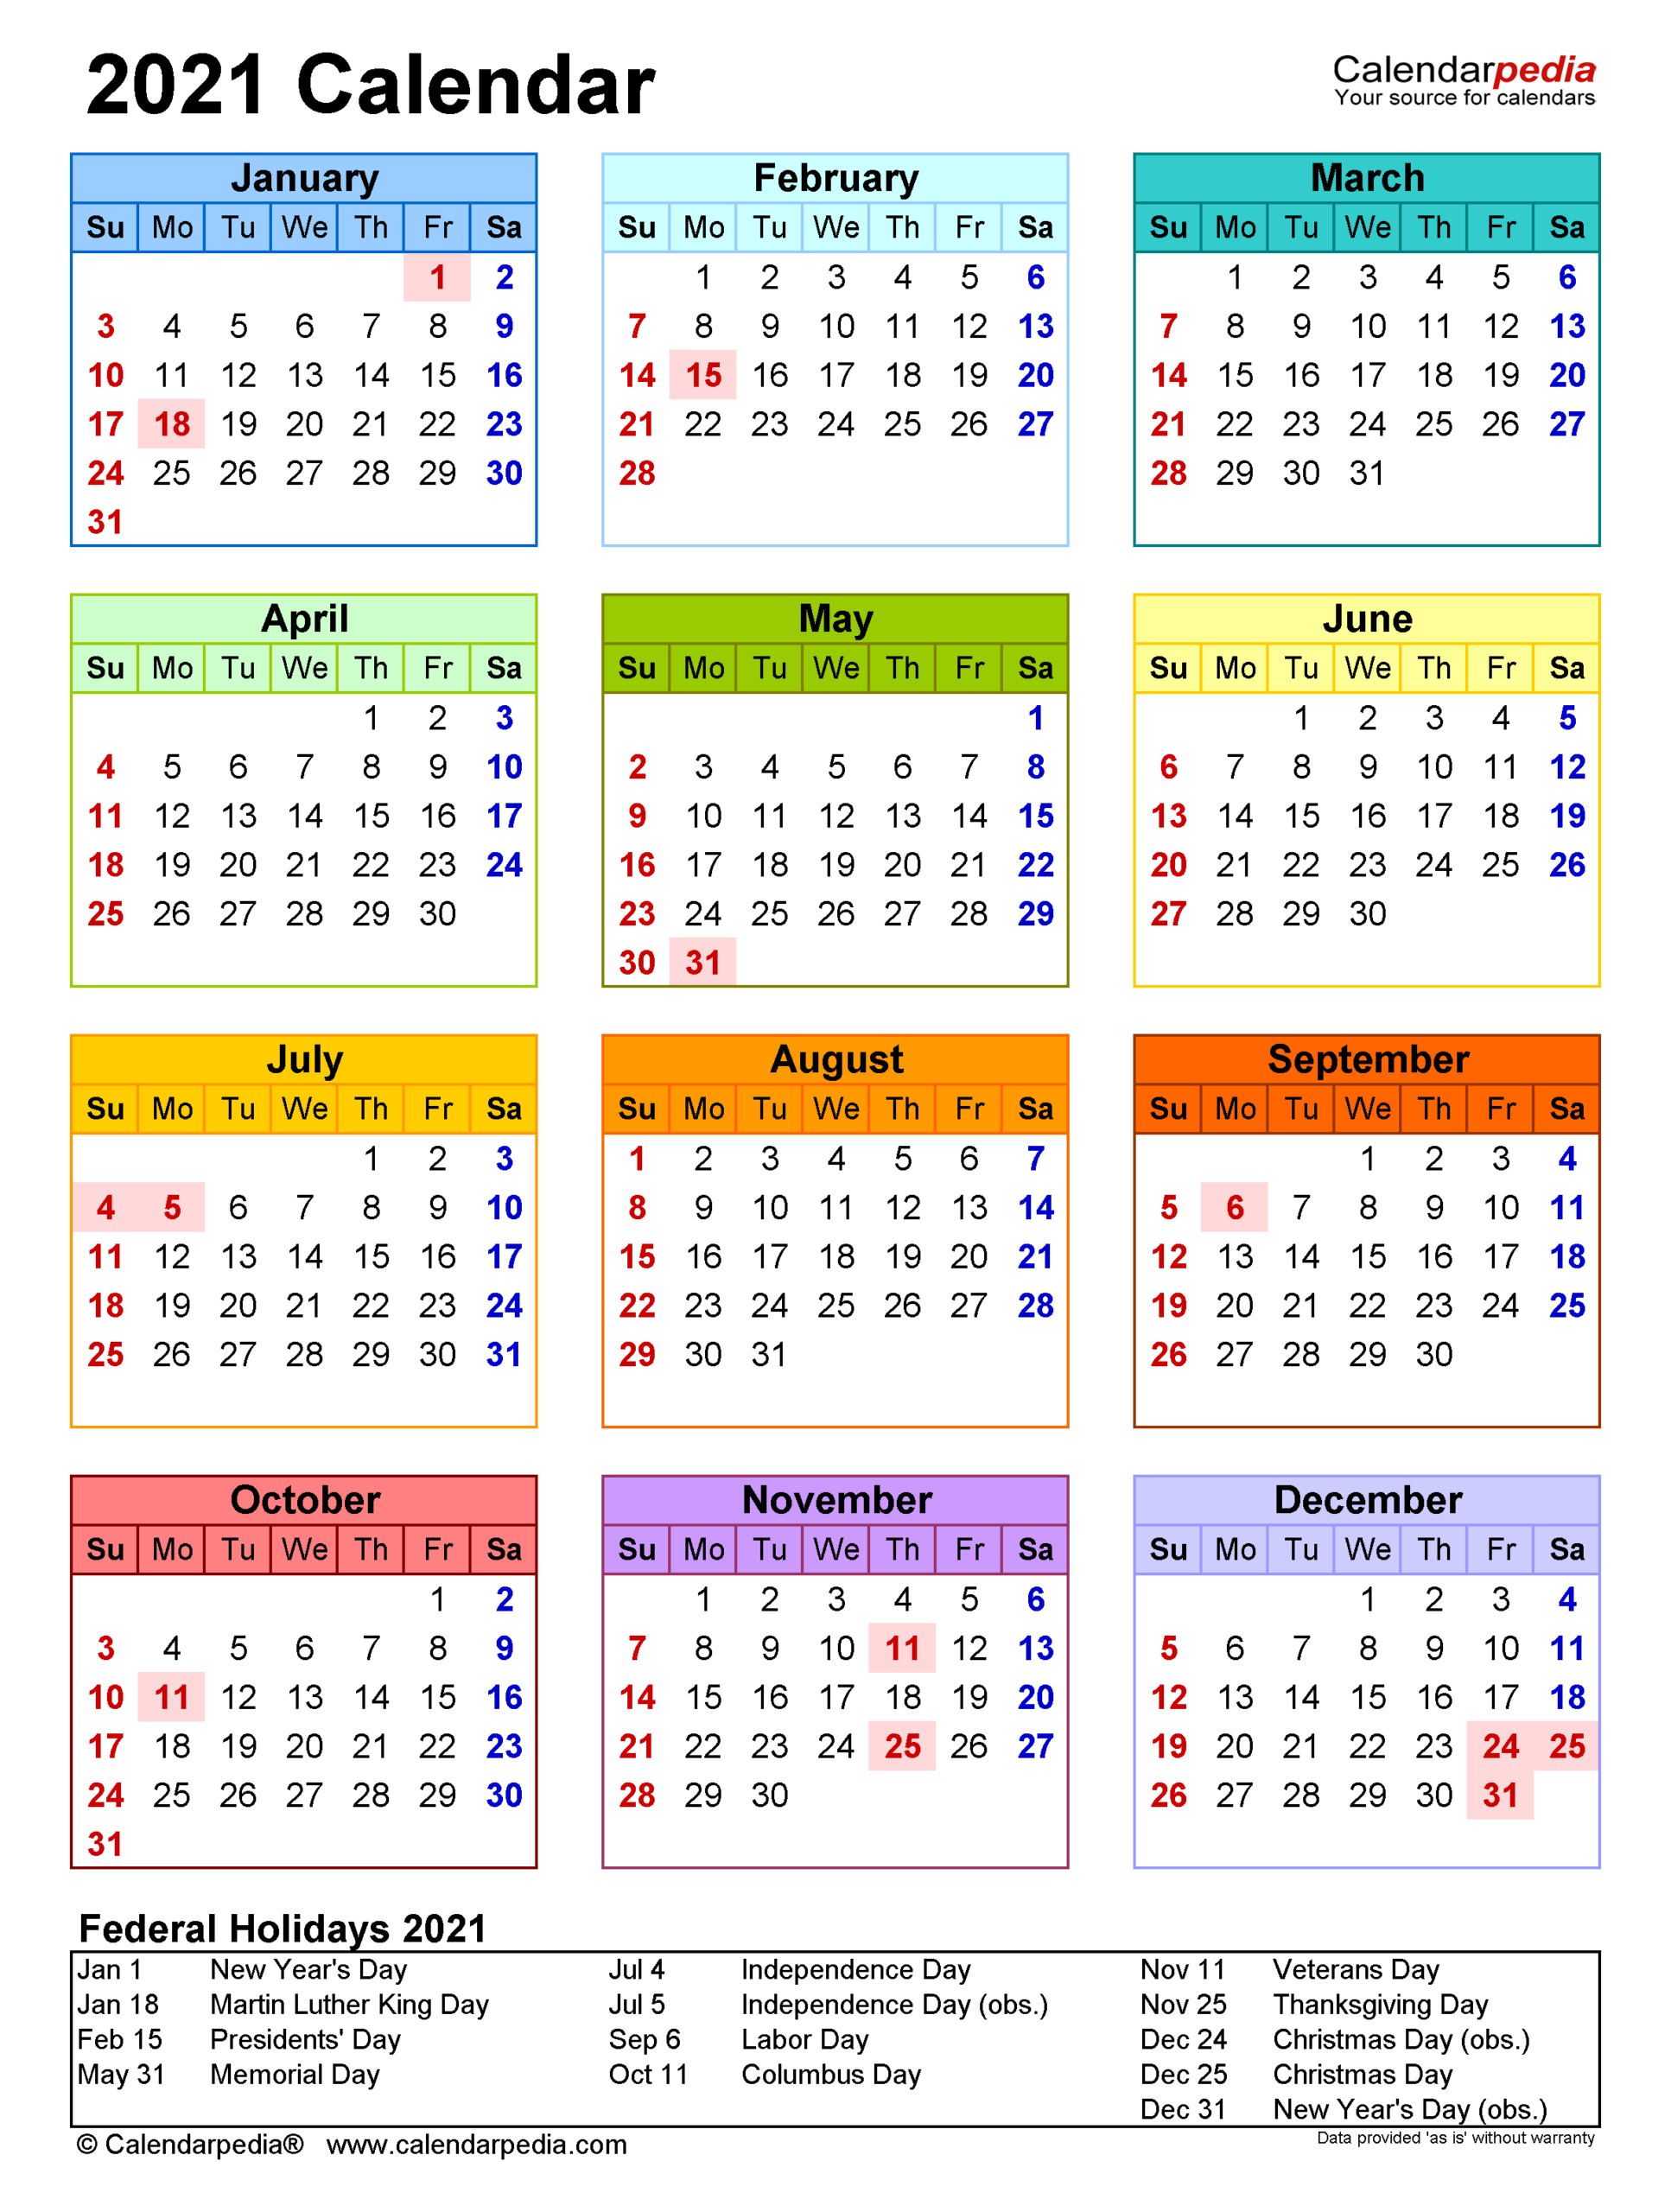 2021 Calendar With Federal Holidays Printable